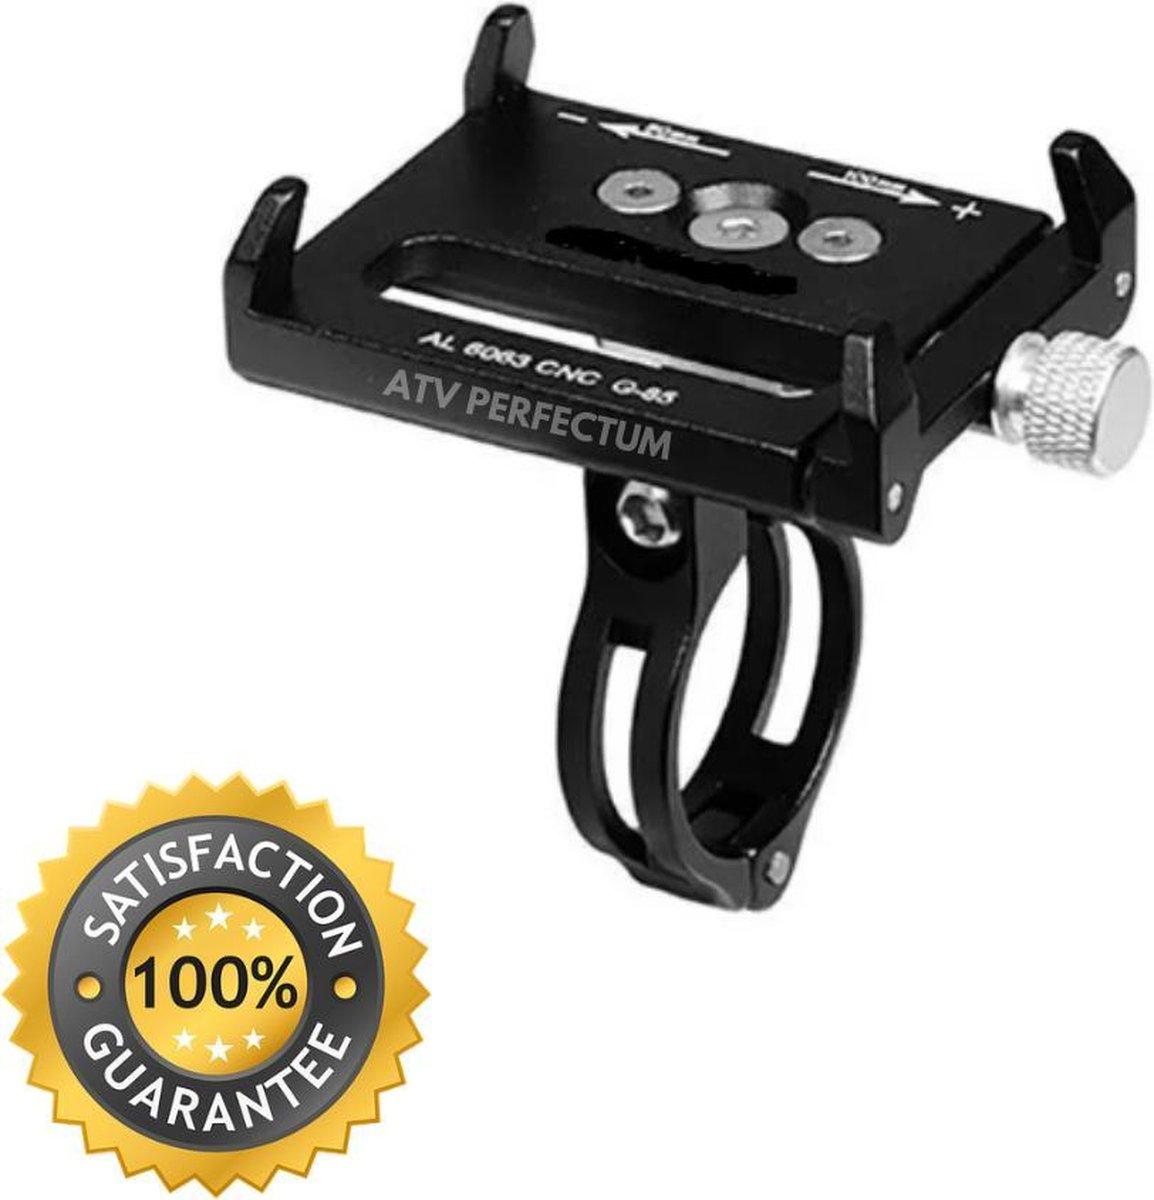 Verstelbare Aluminium Smartphone Fietshouder Zwart - fietshouder voor smartphones - telefoon houder